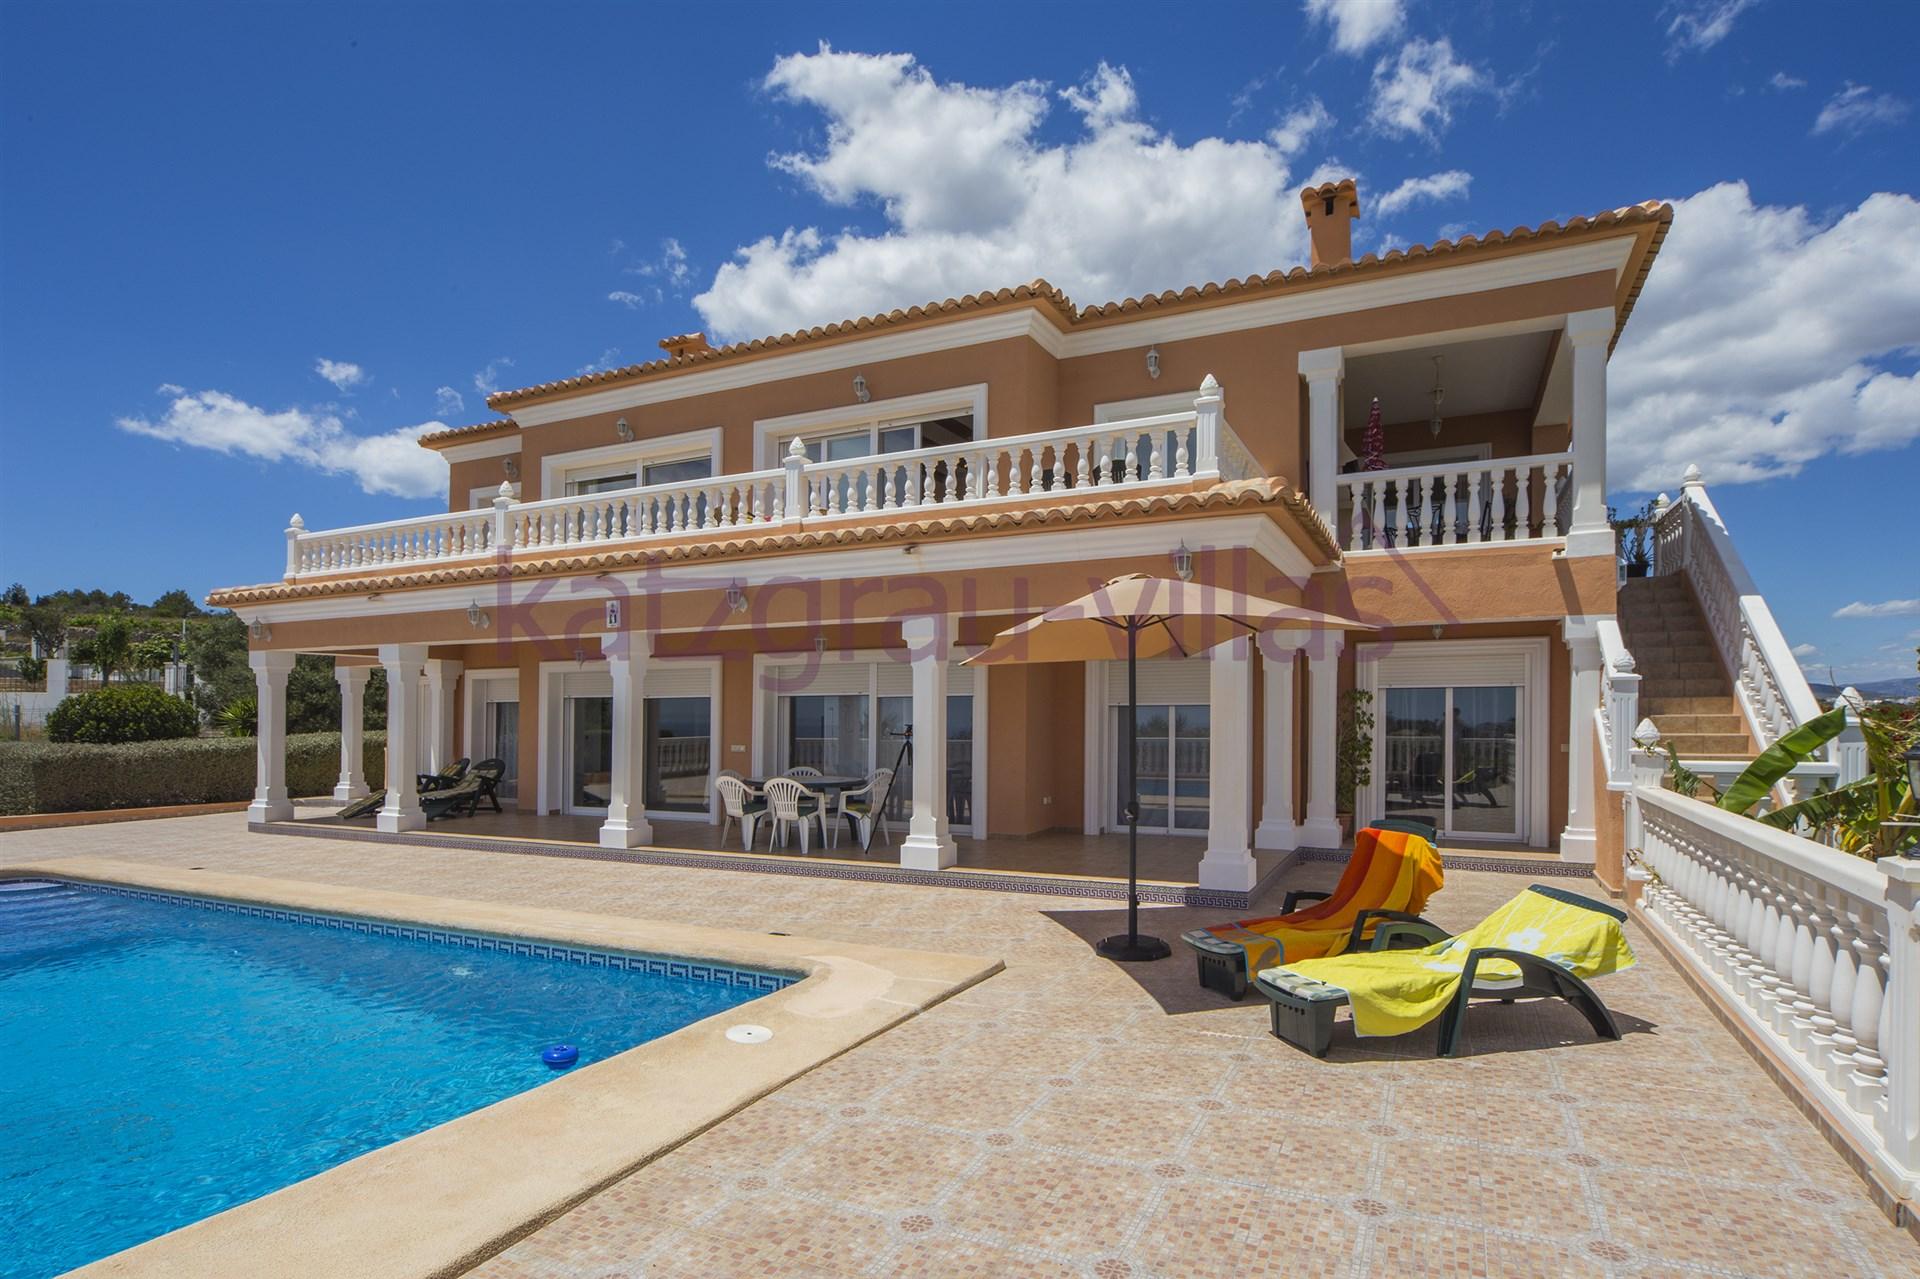 Villa en alquiler en moraira alicante casa baidal alquiler de villas en moraira costa blanca - Apartamentos alicante alquiler ...